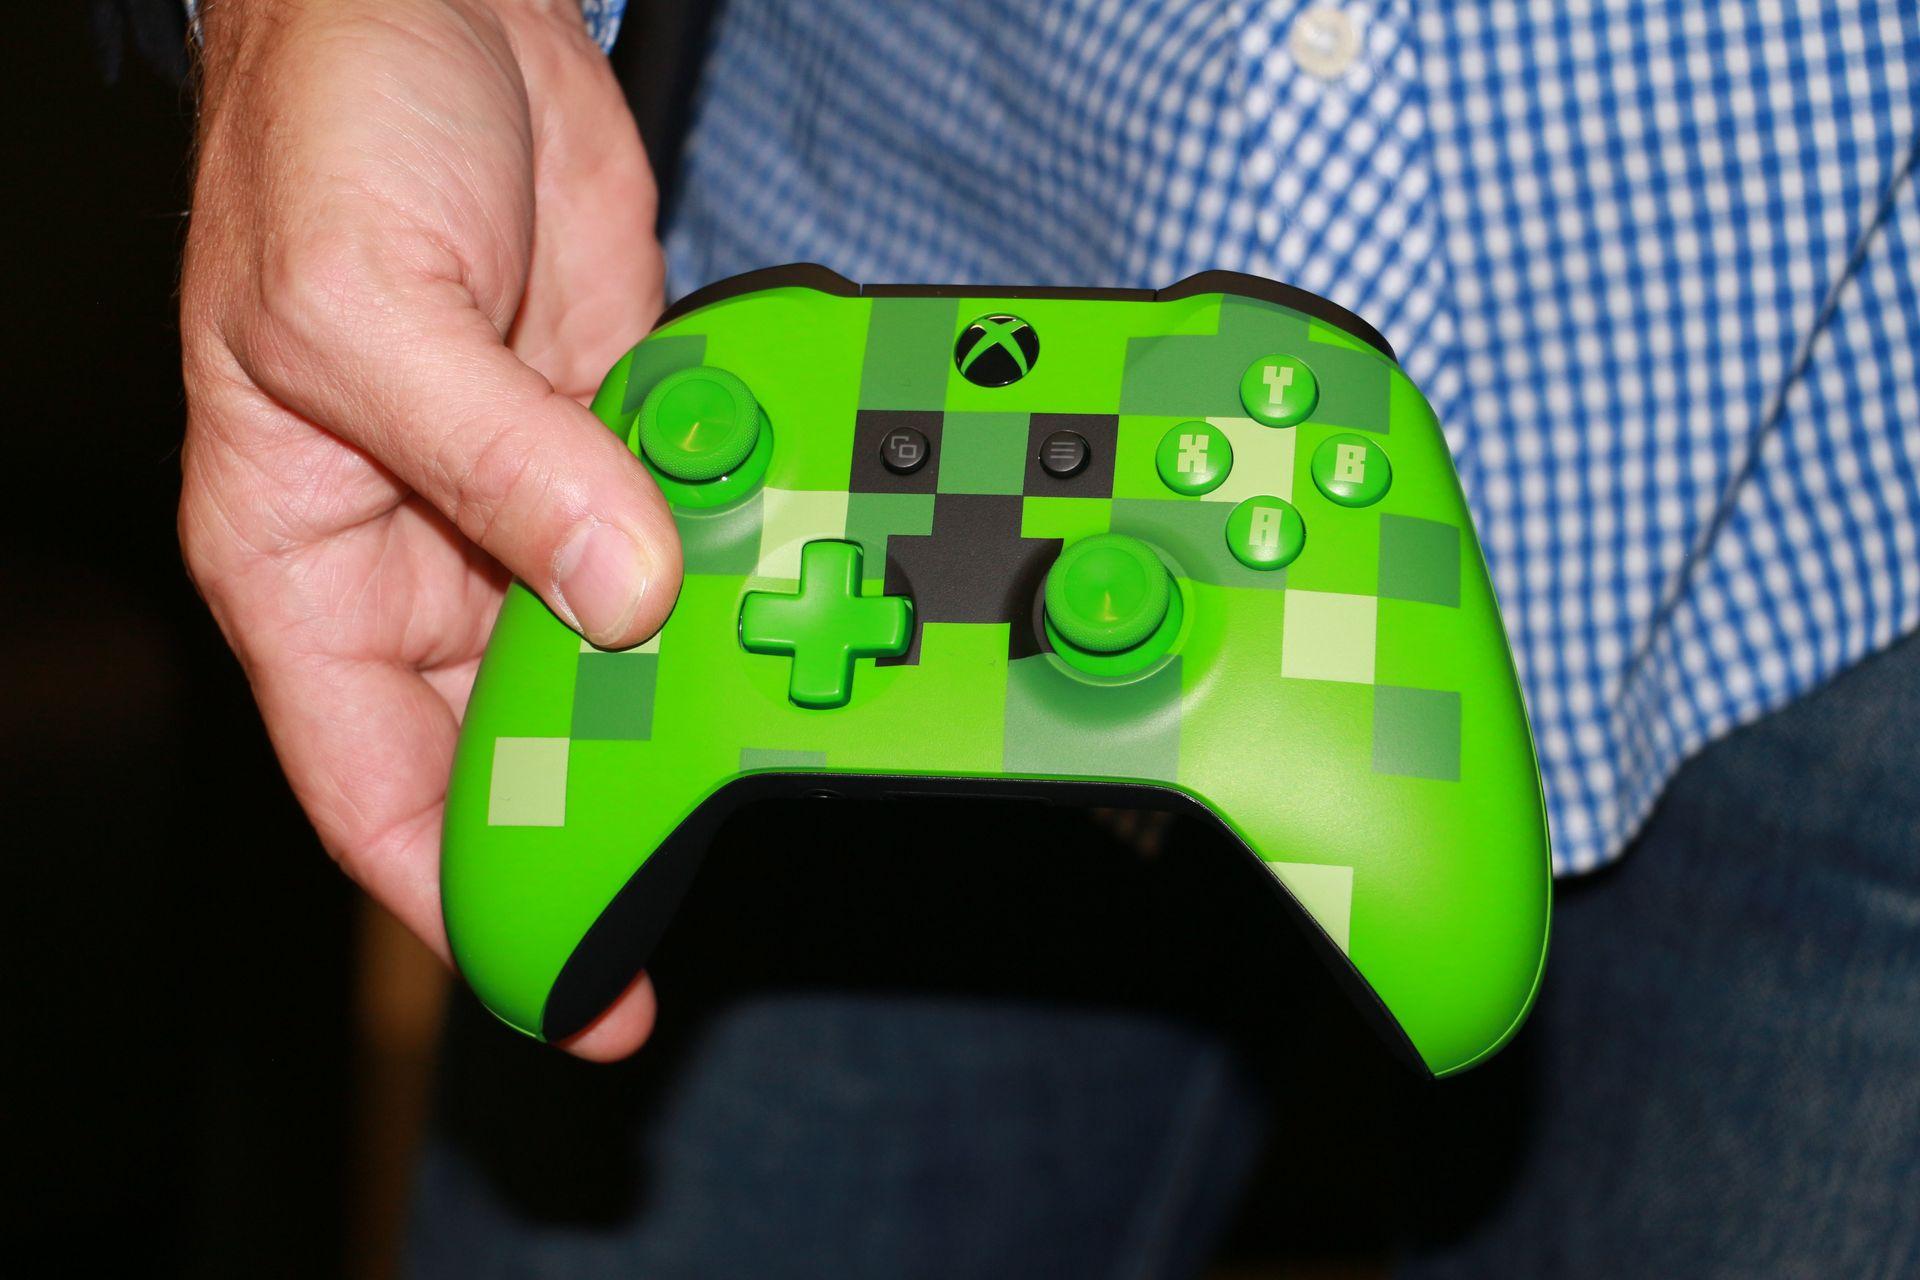 gamescomで参考展示されていた「Xbox One S 1TB Minecraft リミテッドエディション」